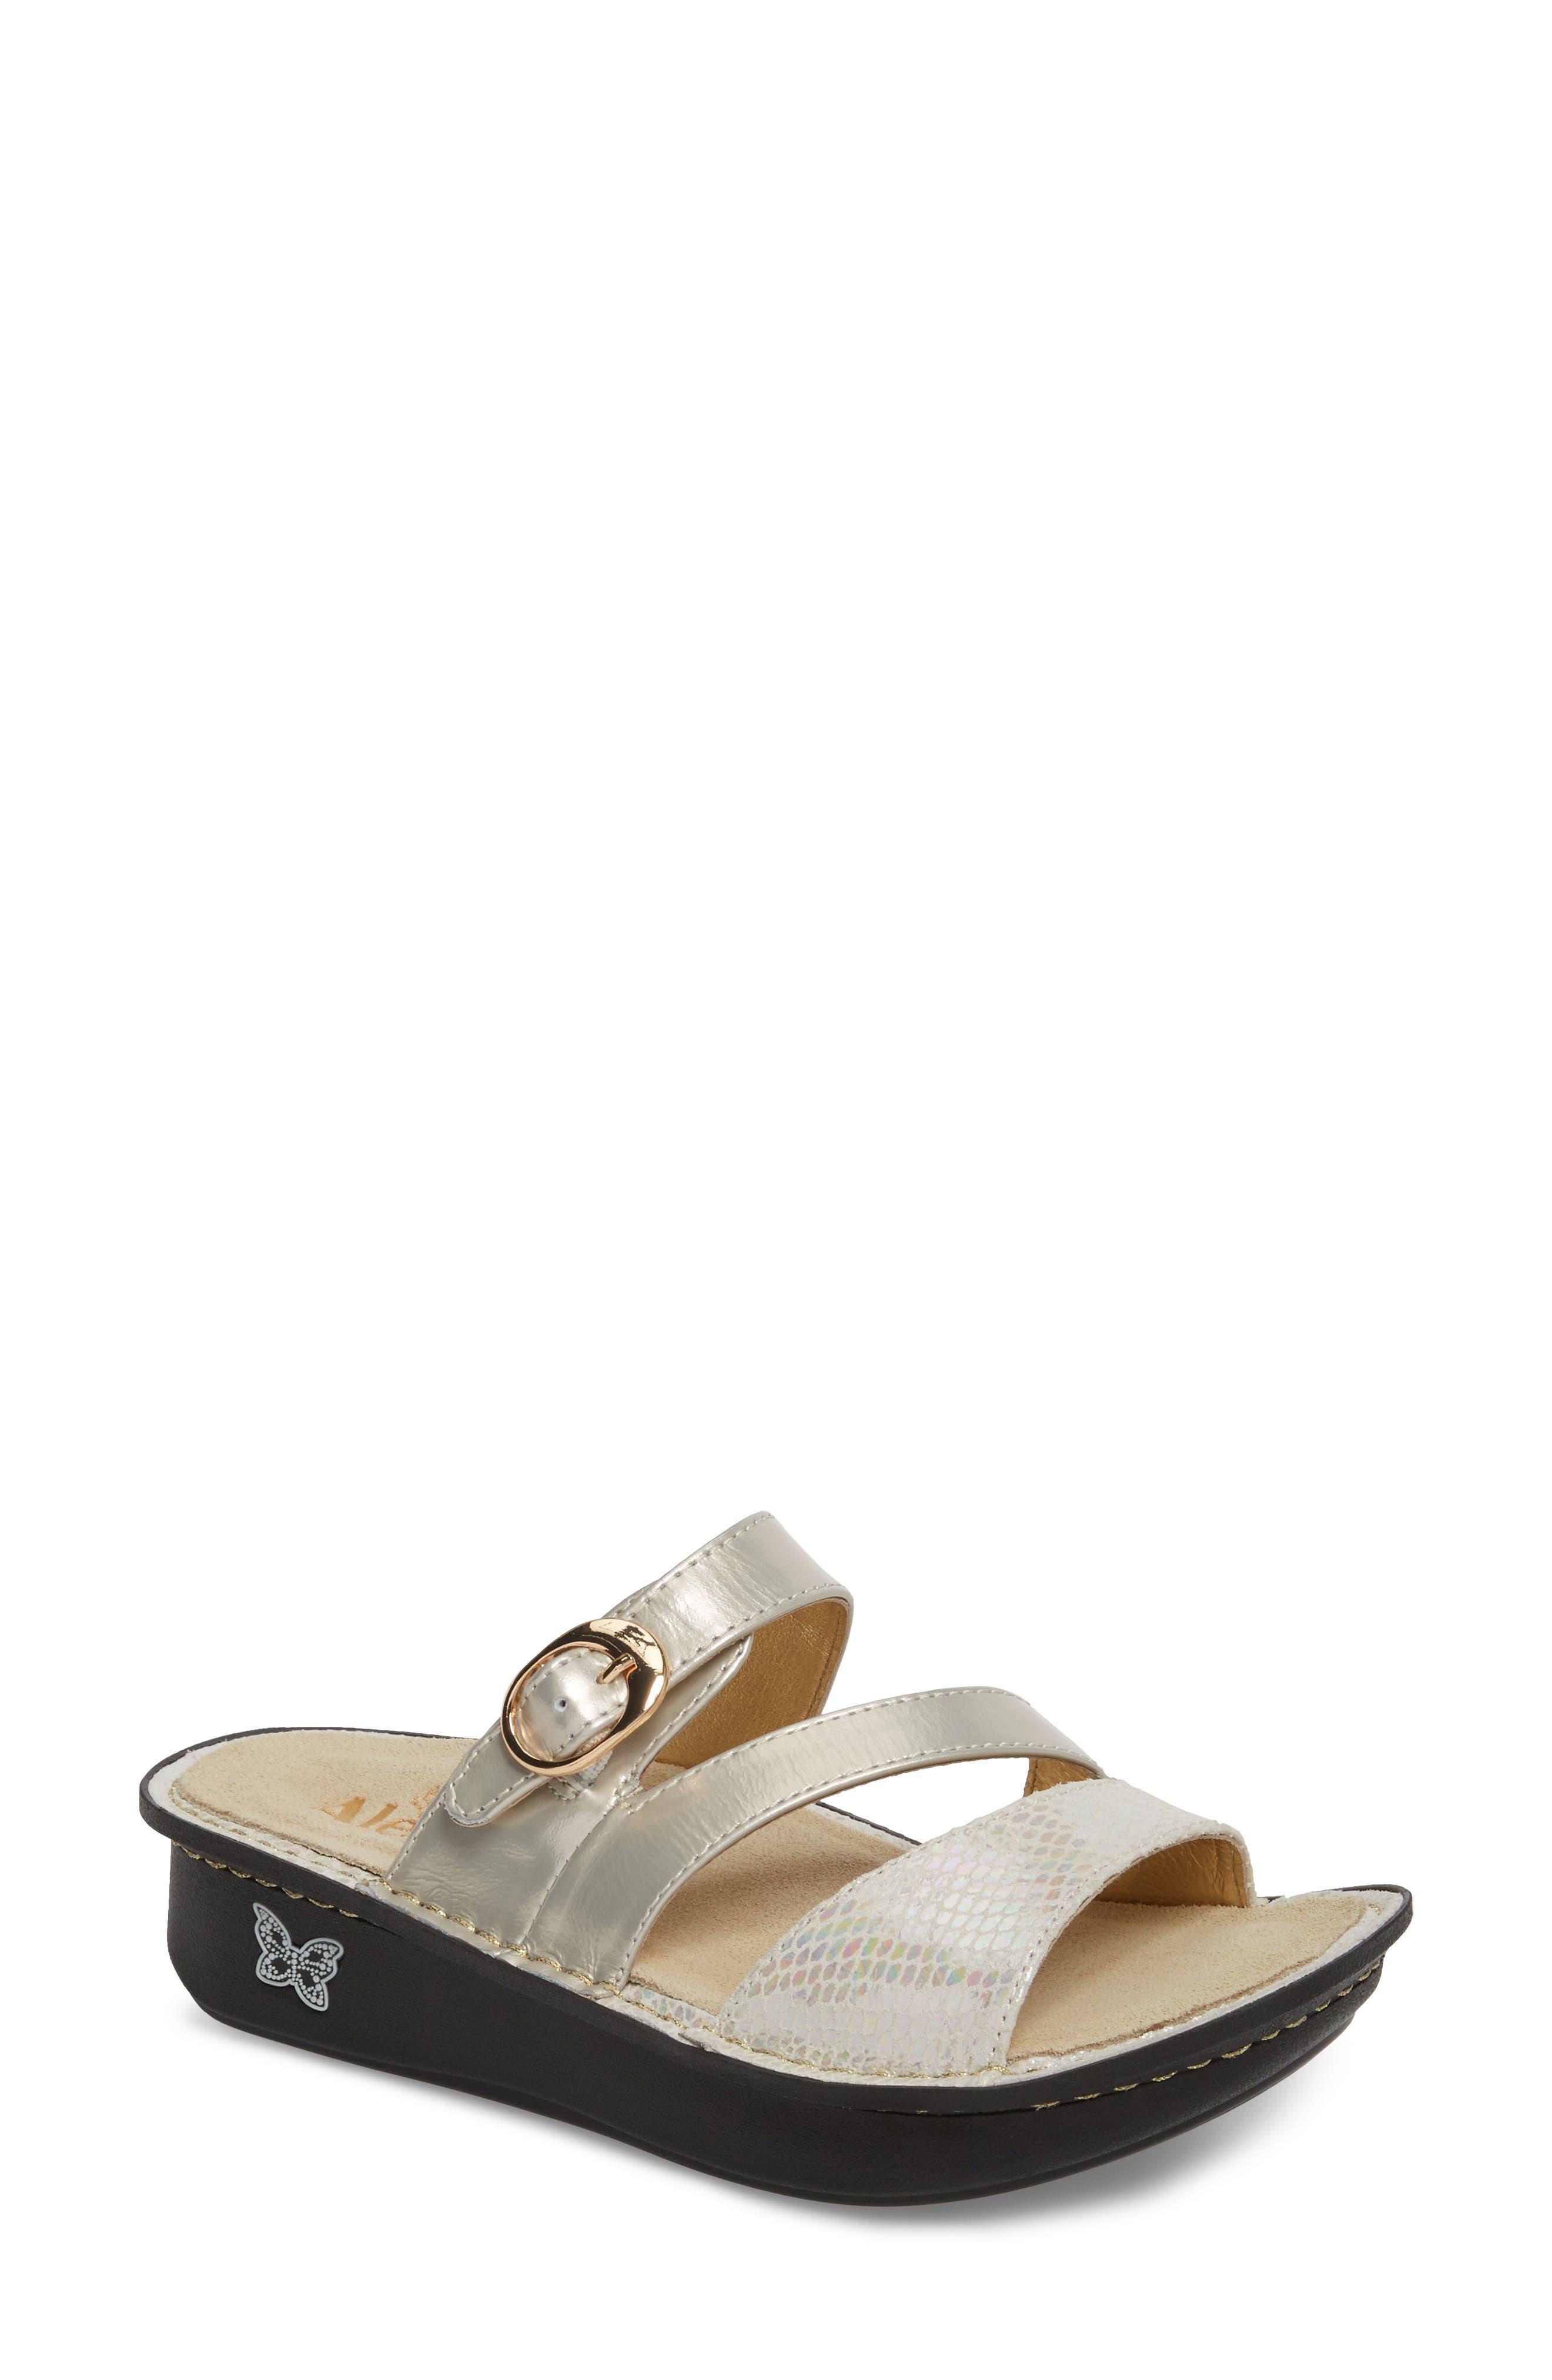 ALEGRIA, 'Colette' Platform Sandal, Main thumbnail 1, color, OPFULLY LEATHER